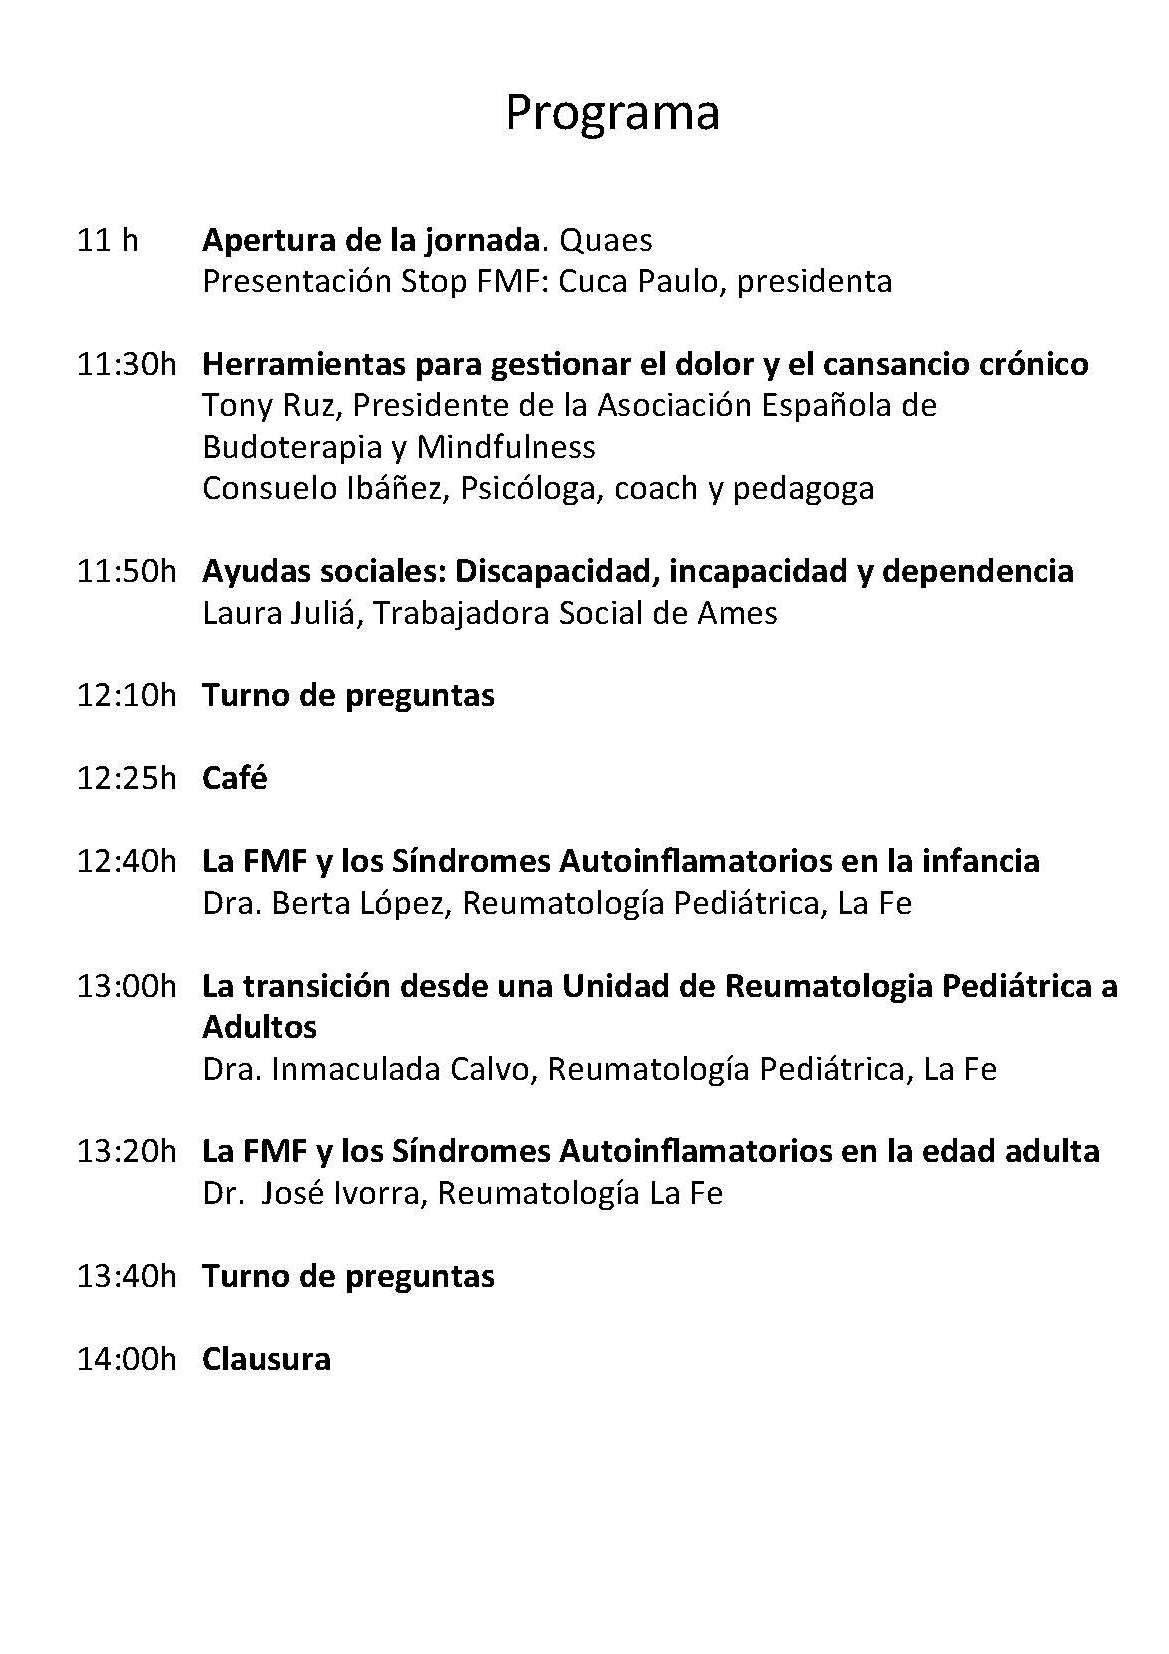 Programa I Jornada FMF